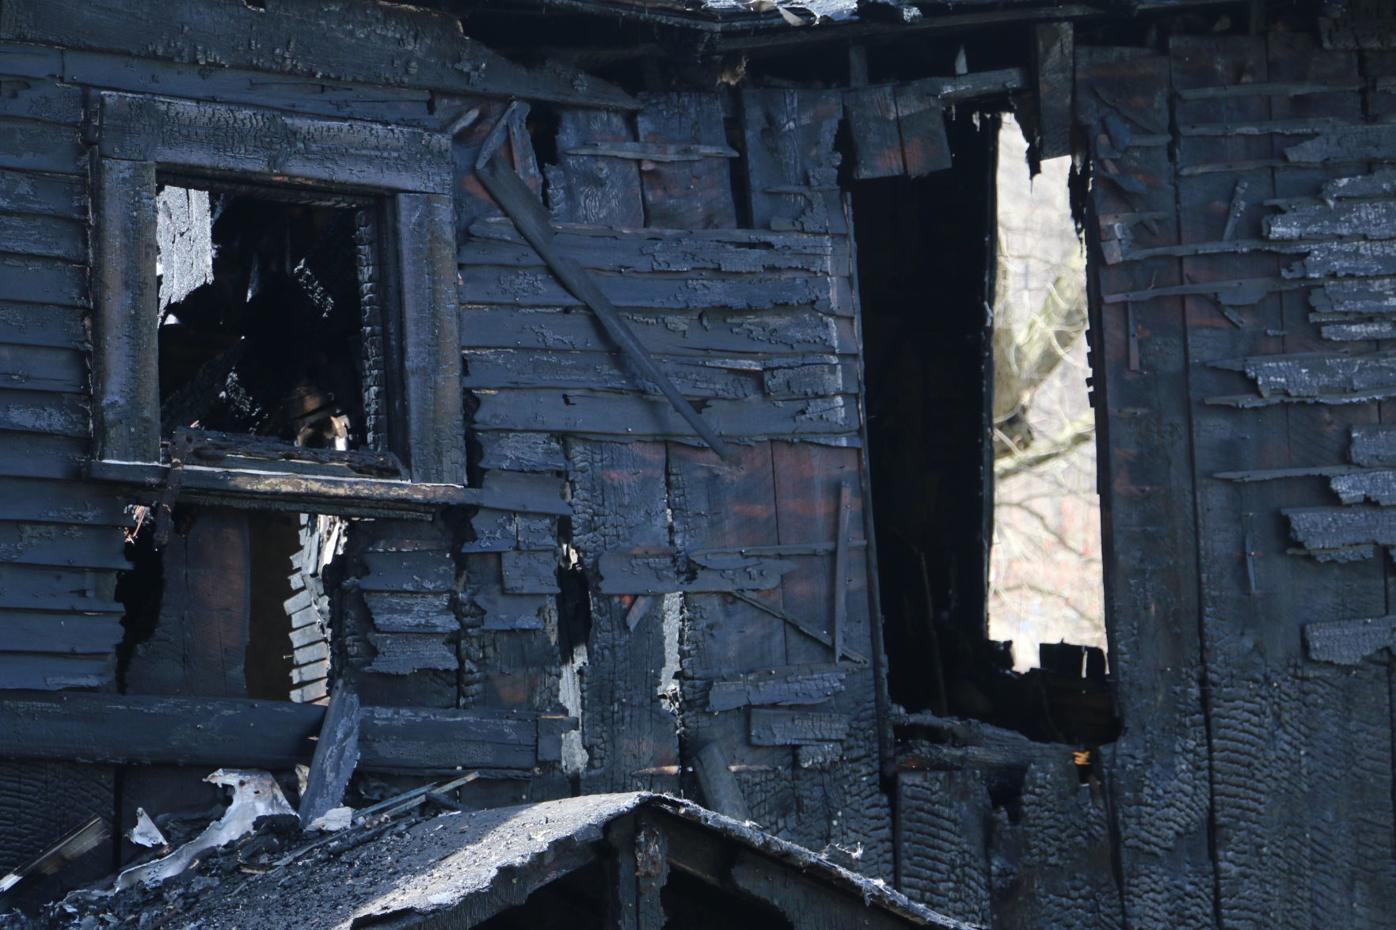 Albright fire closeup